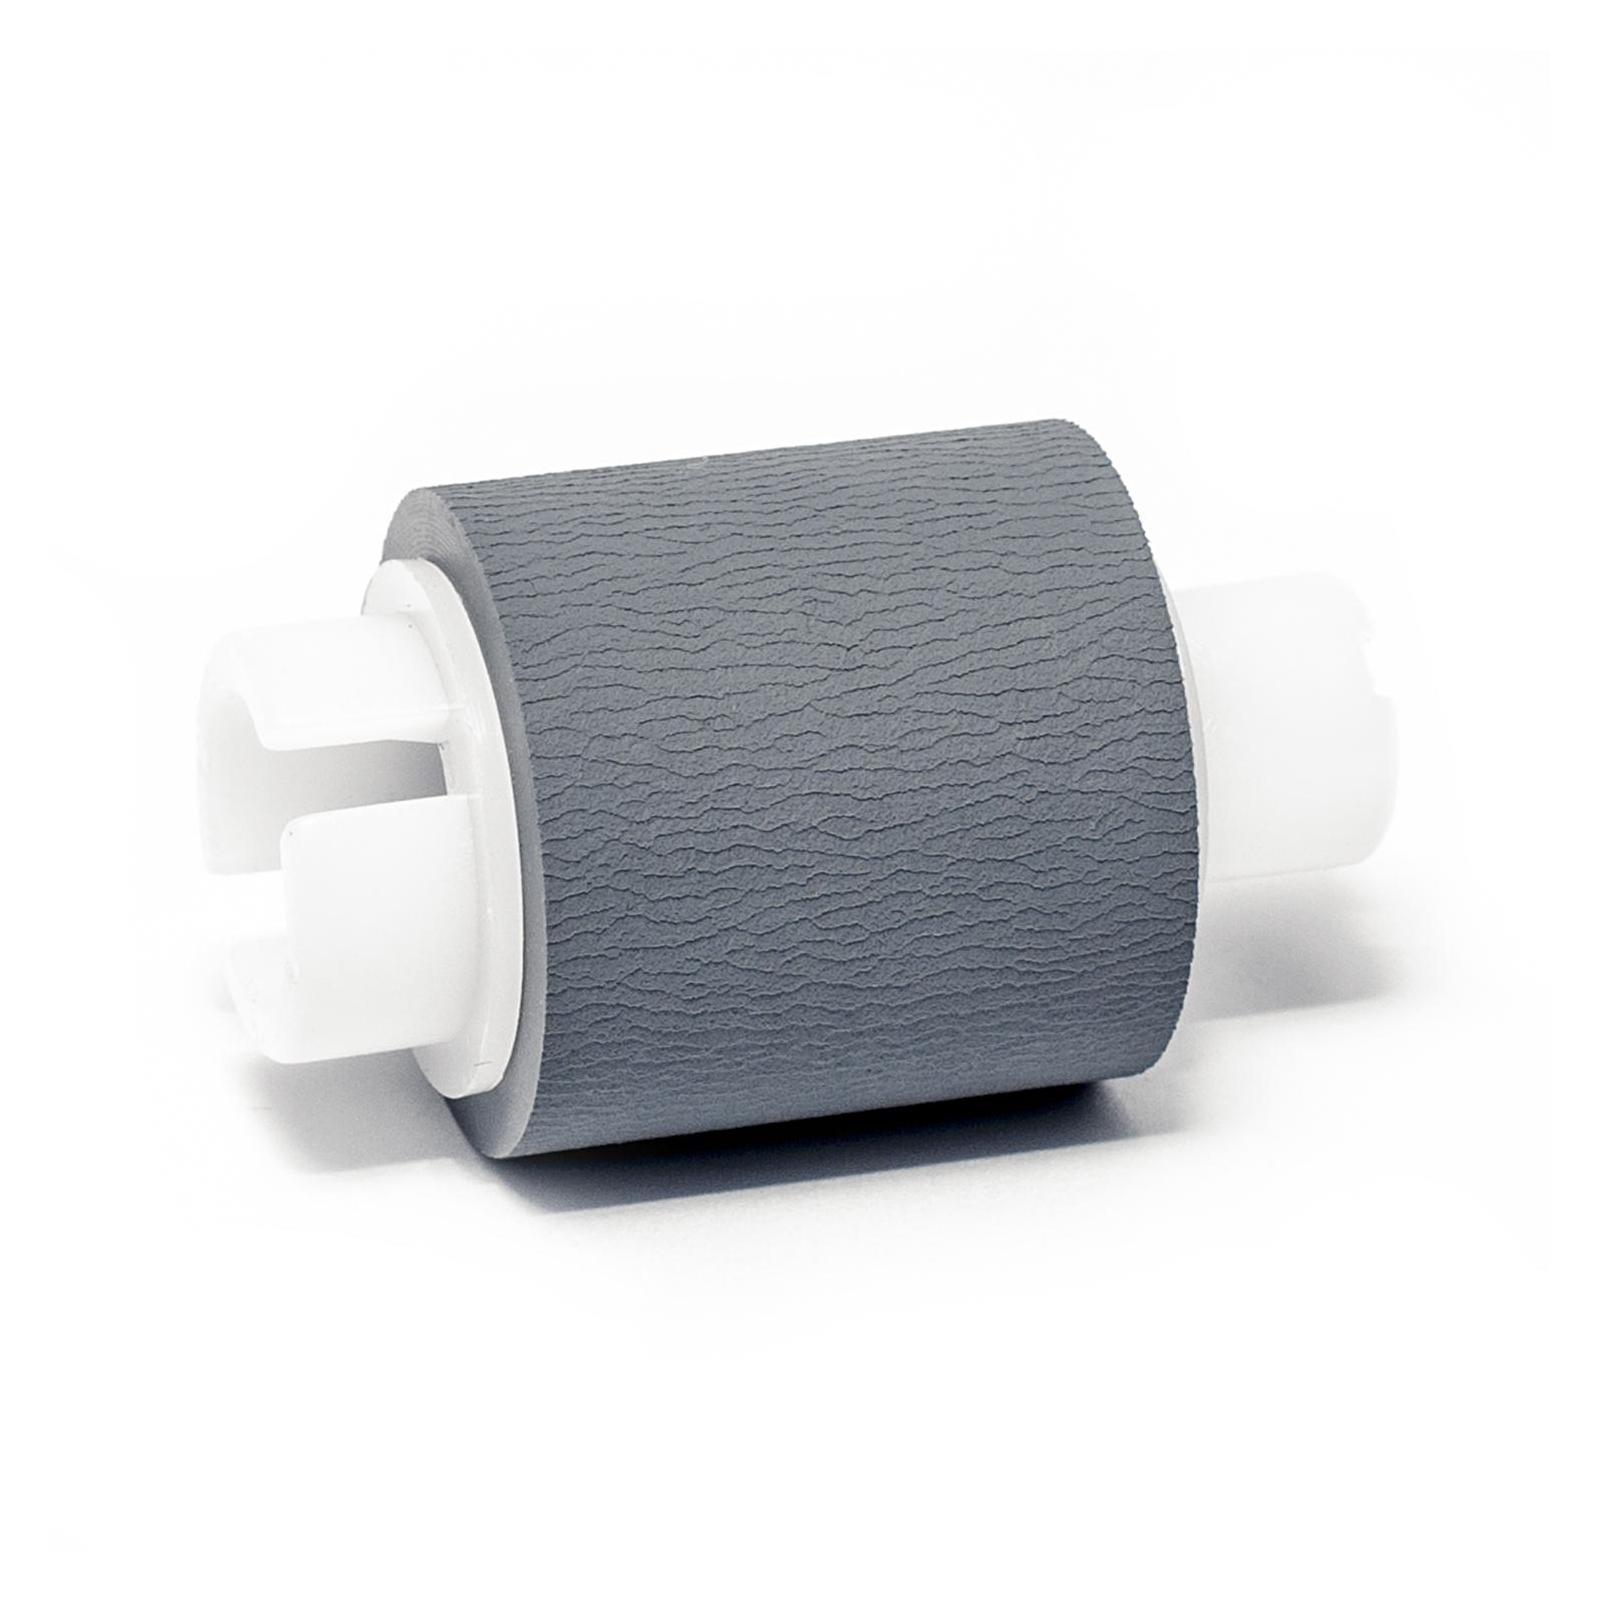 Ролик CANON iR-1018/1022/1020/1024 (FL2-3887) Feed Roller CET (CET3966)